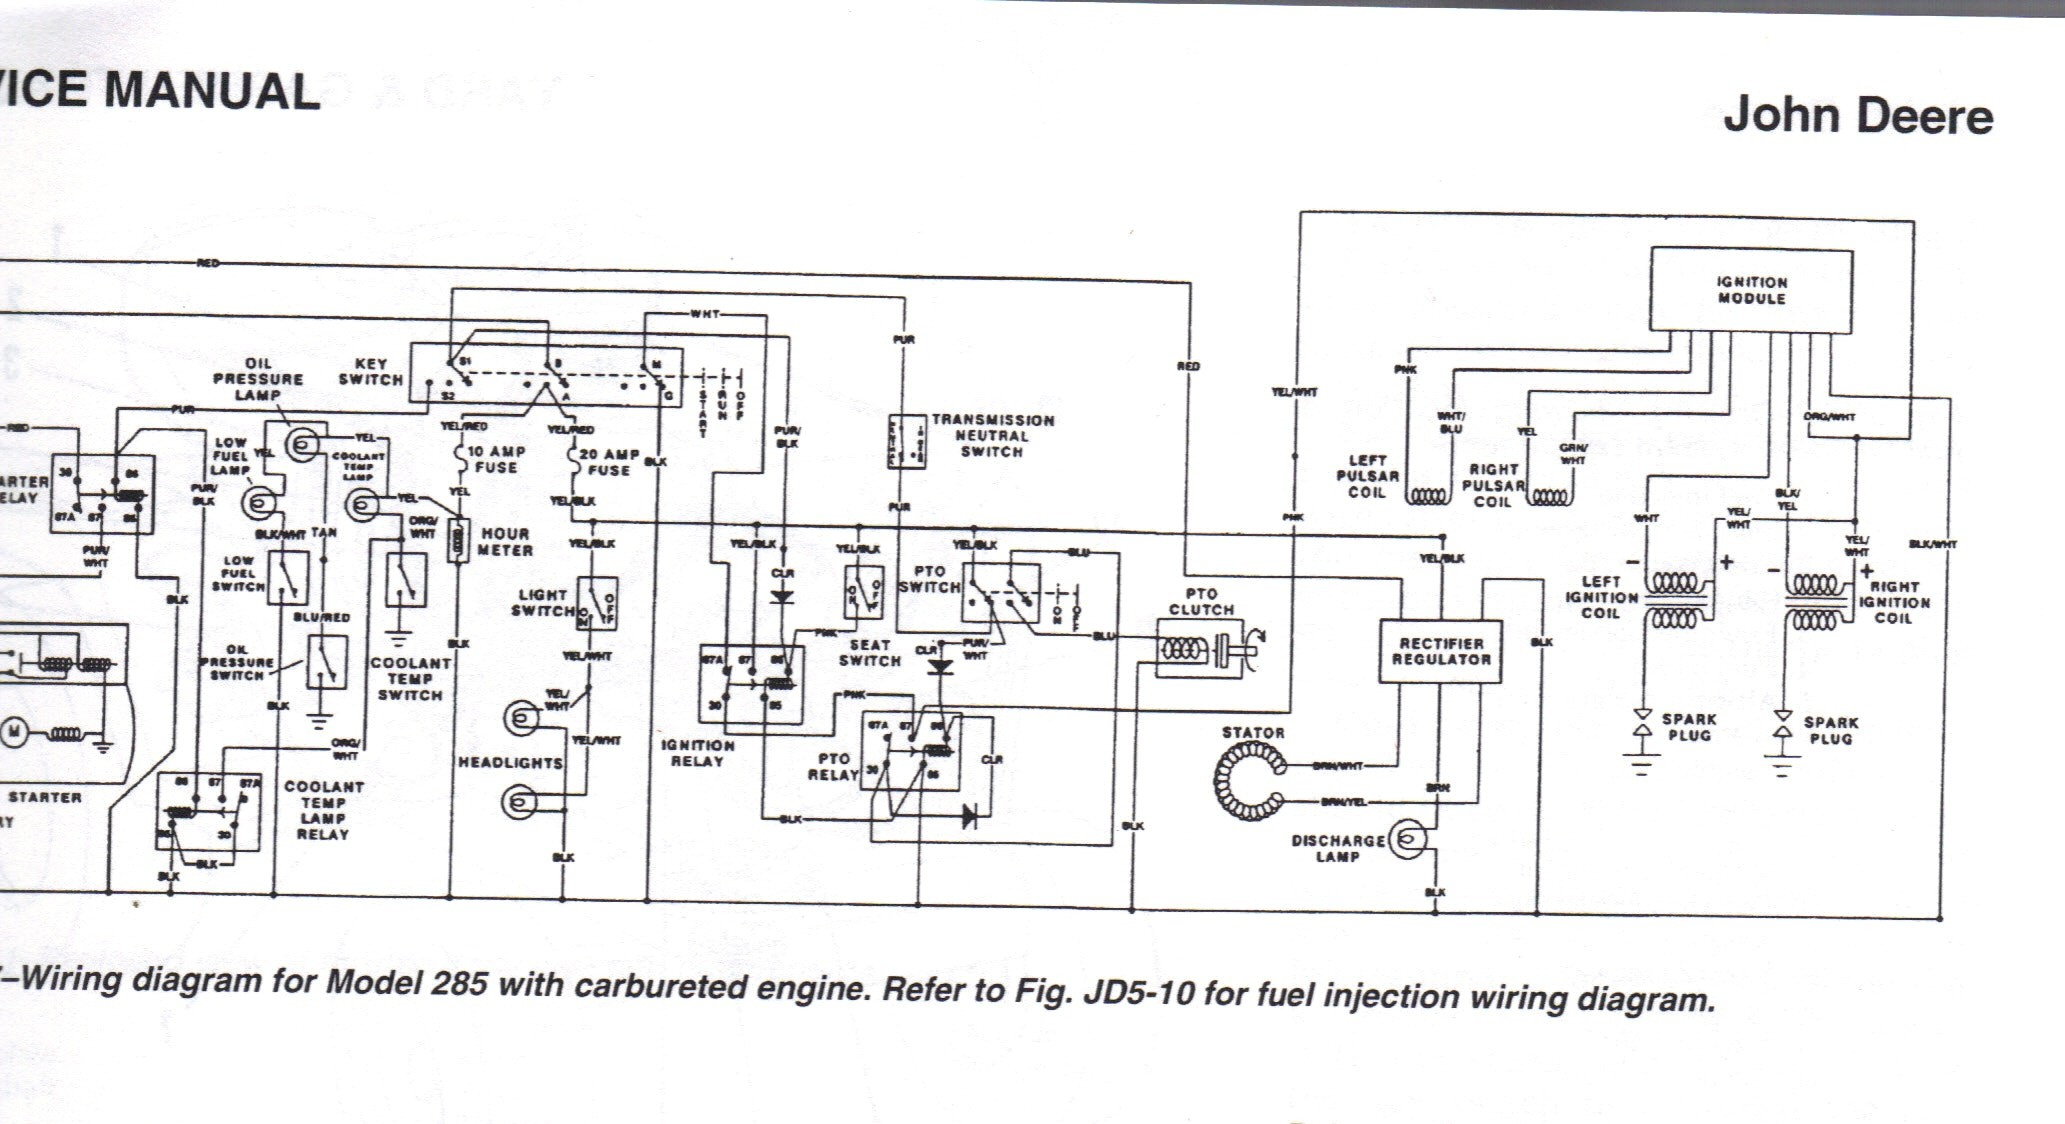 Wiring Diagram for John Deere Lt155 Fresh Gemütlich John Deere L125 Schaltplan Ideen Die Besten Elektrischen